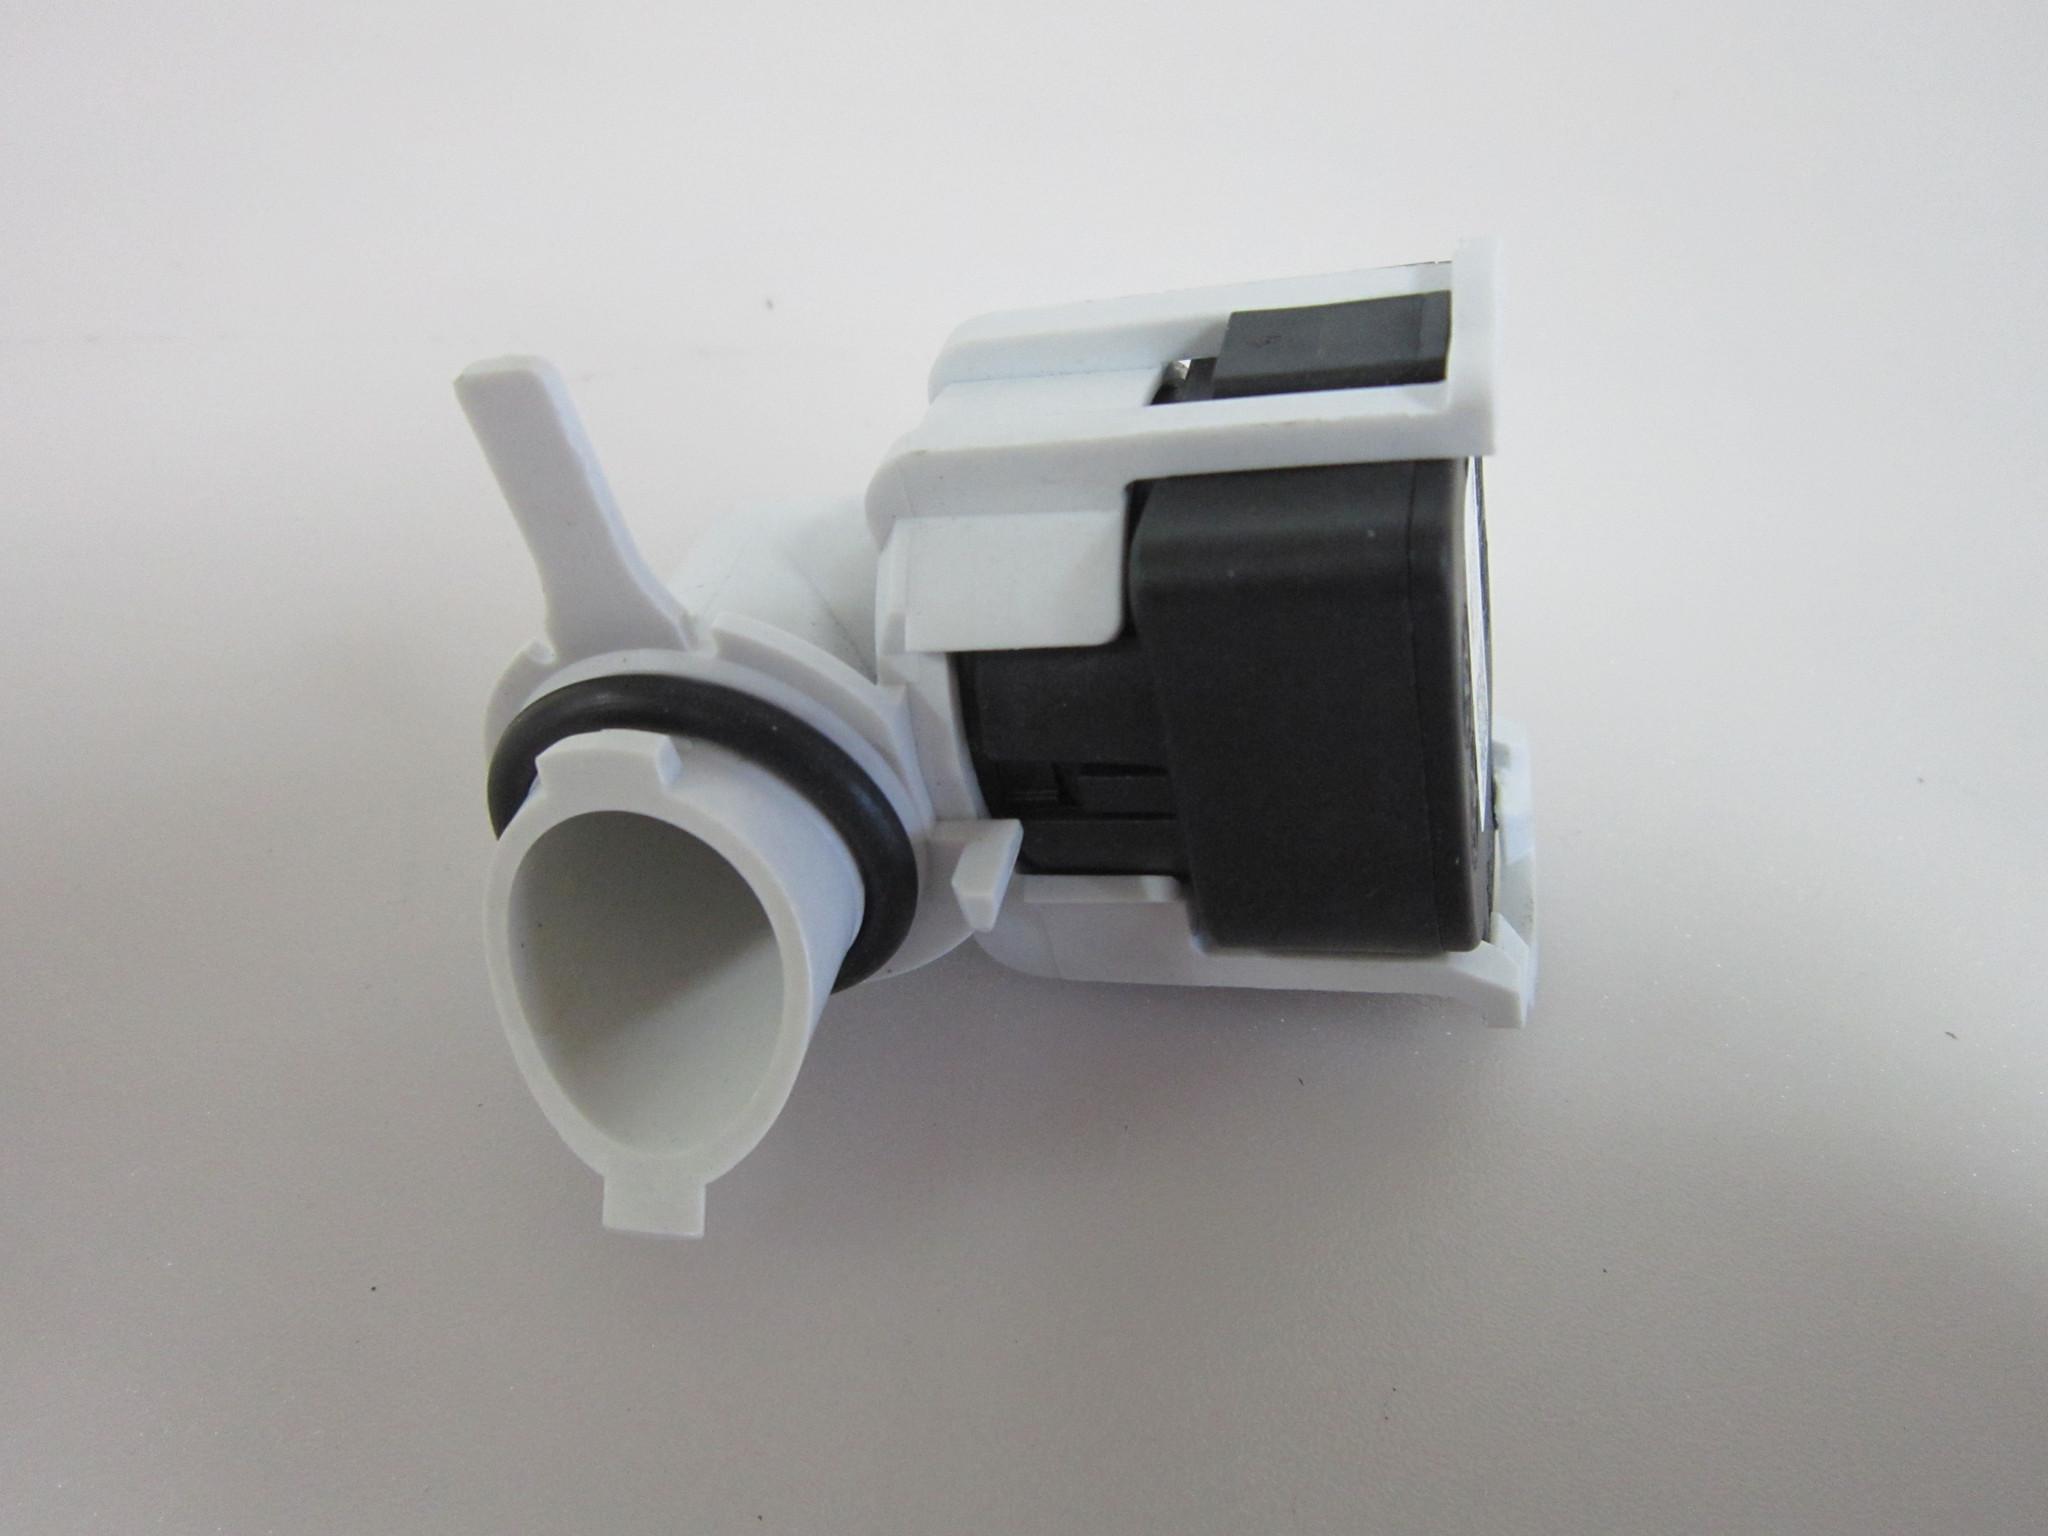 GE Dishwasher Pressure sensor asmWD21X25468 WD21X25468